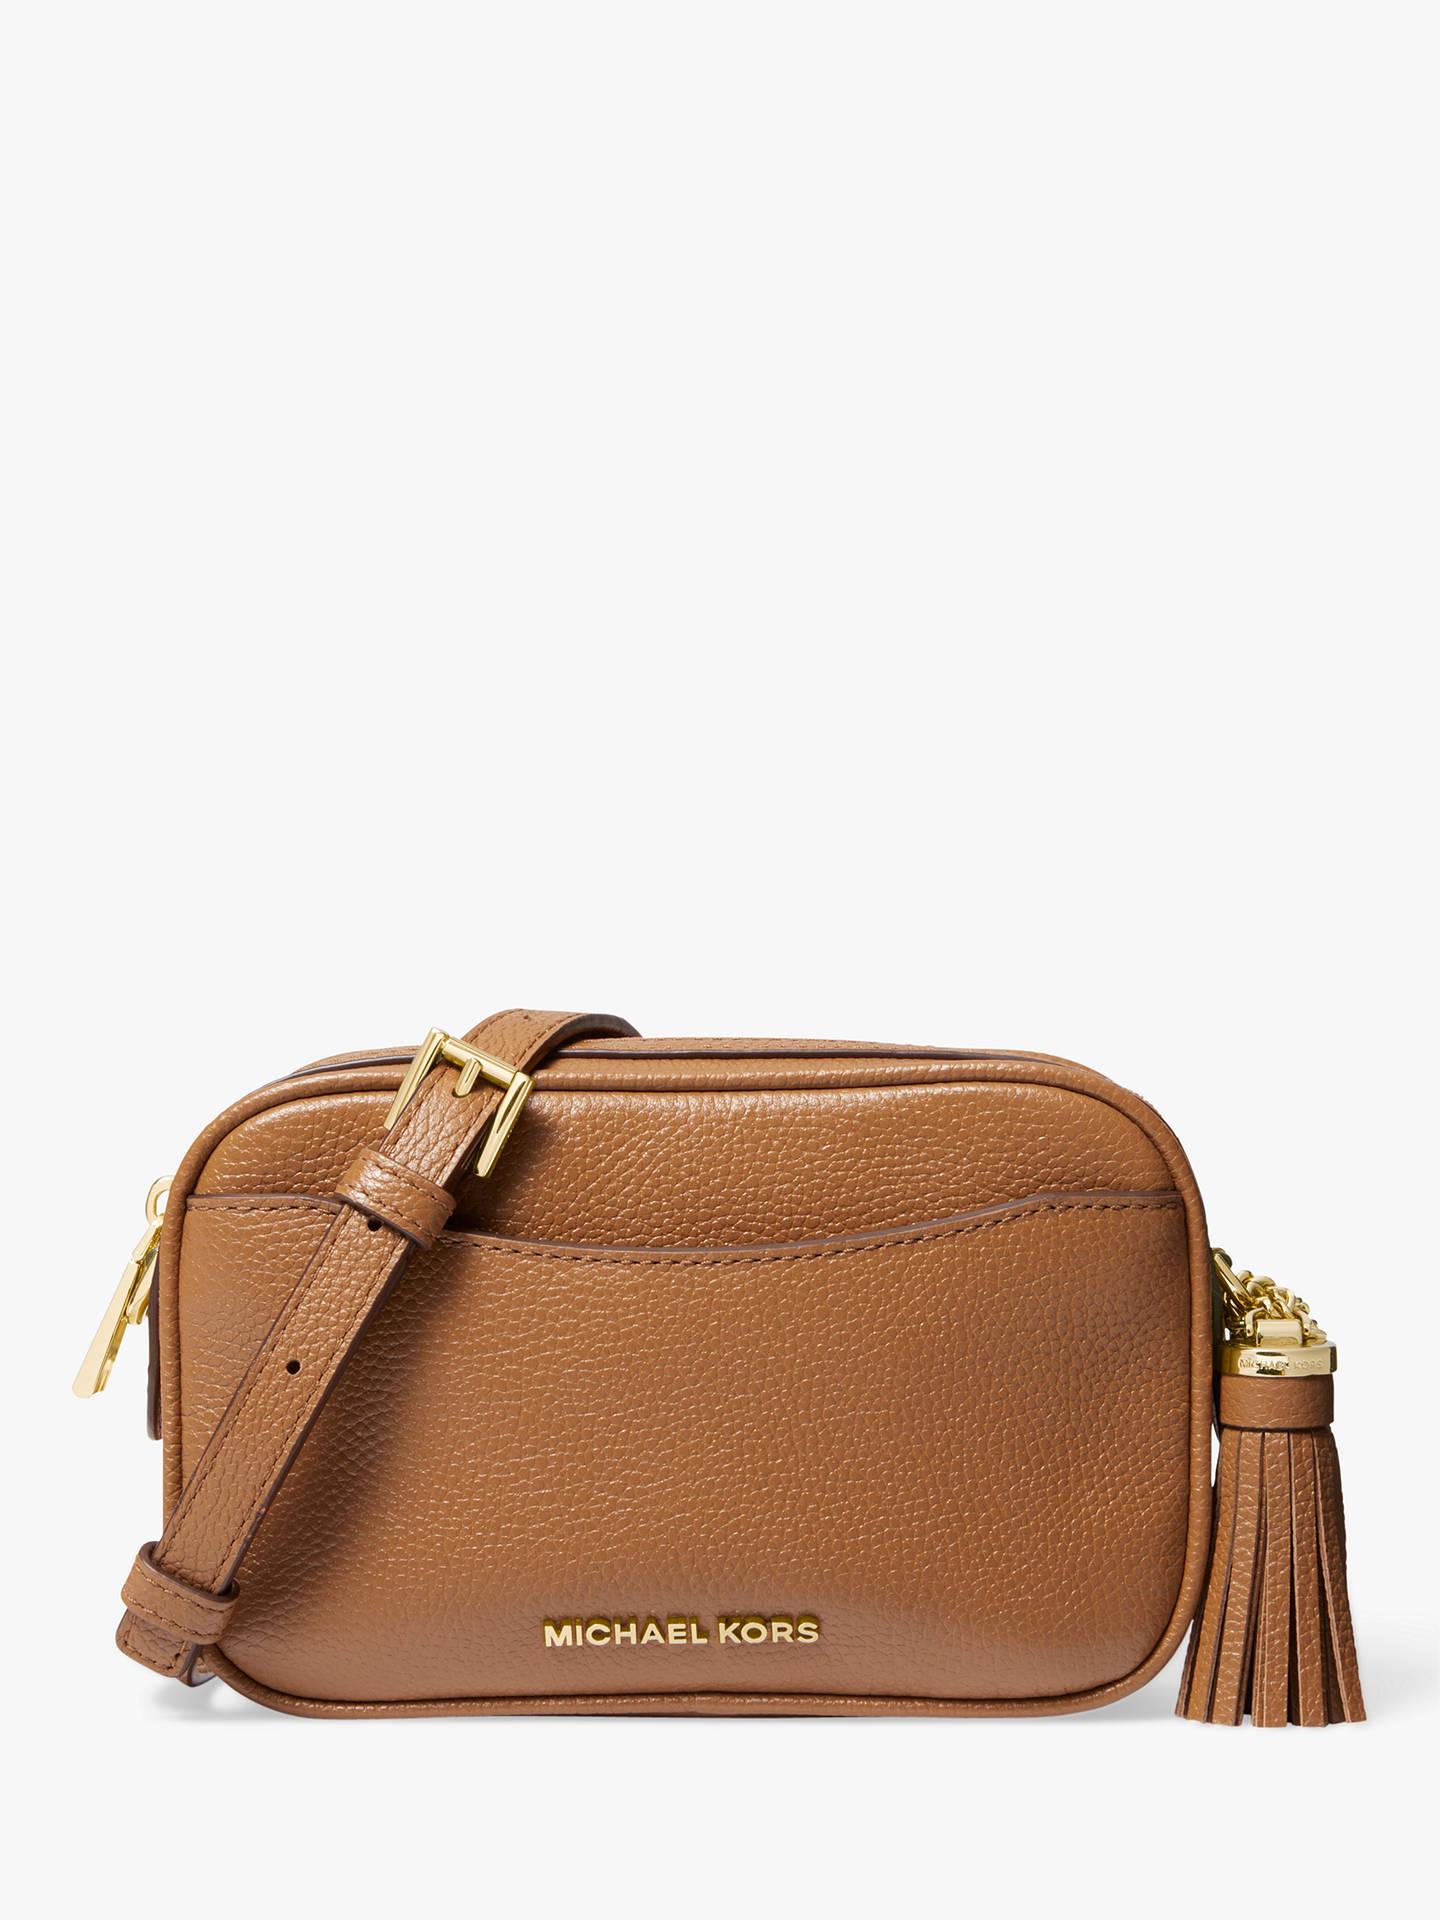 febee72fe Buy MICHAEL Michael Kors Pebbled Leather Convertible Camera Bag, Acorn  Online at johnlewis.com ...